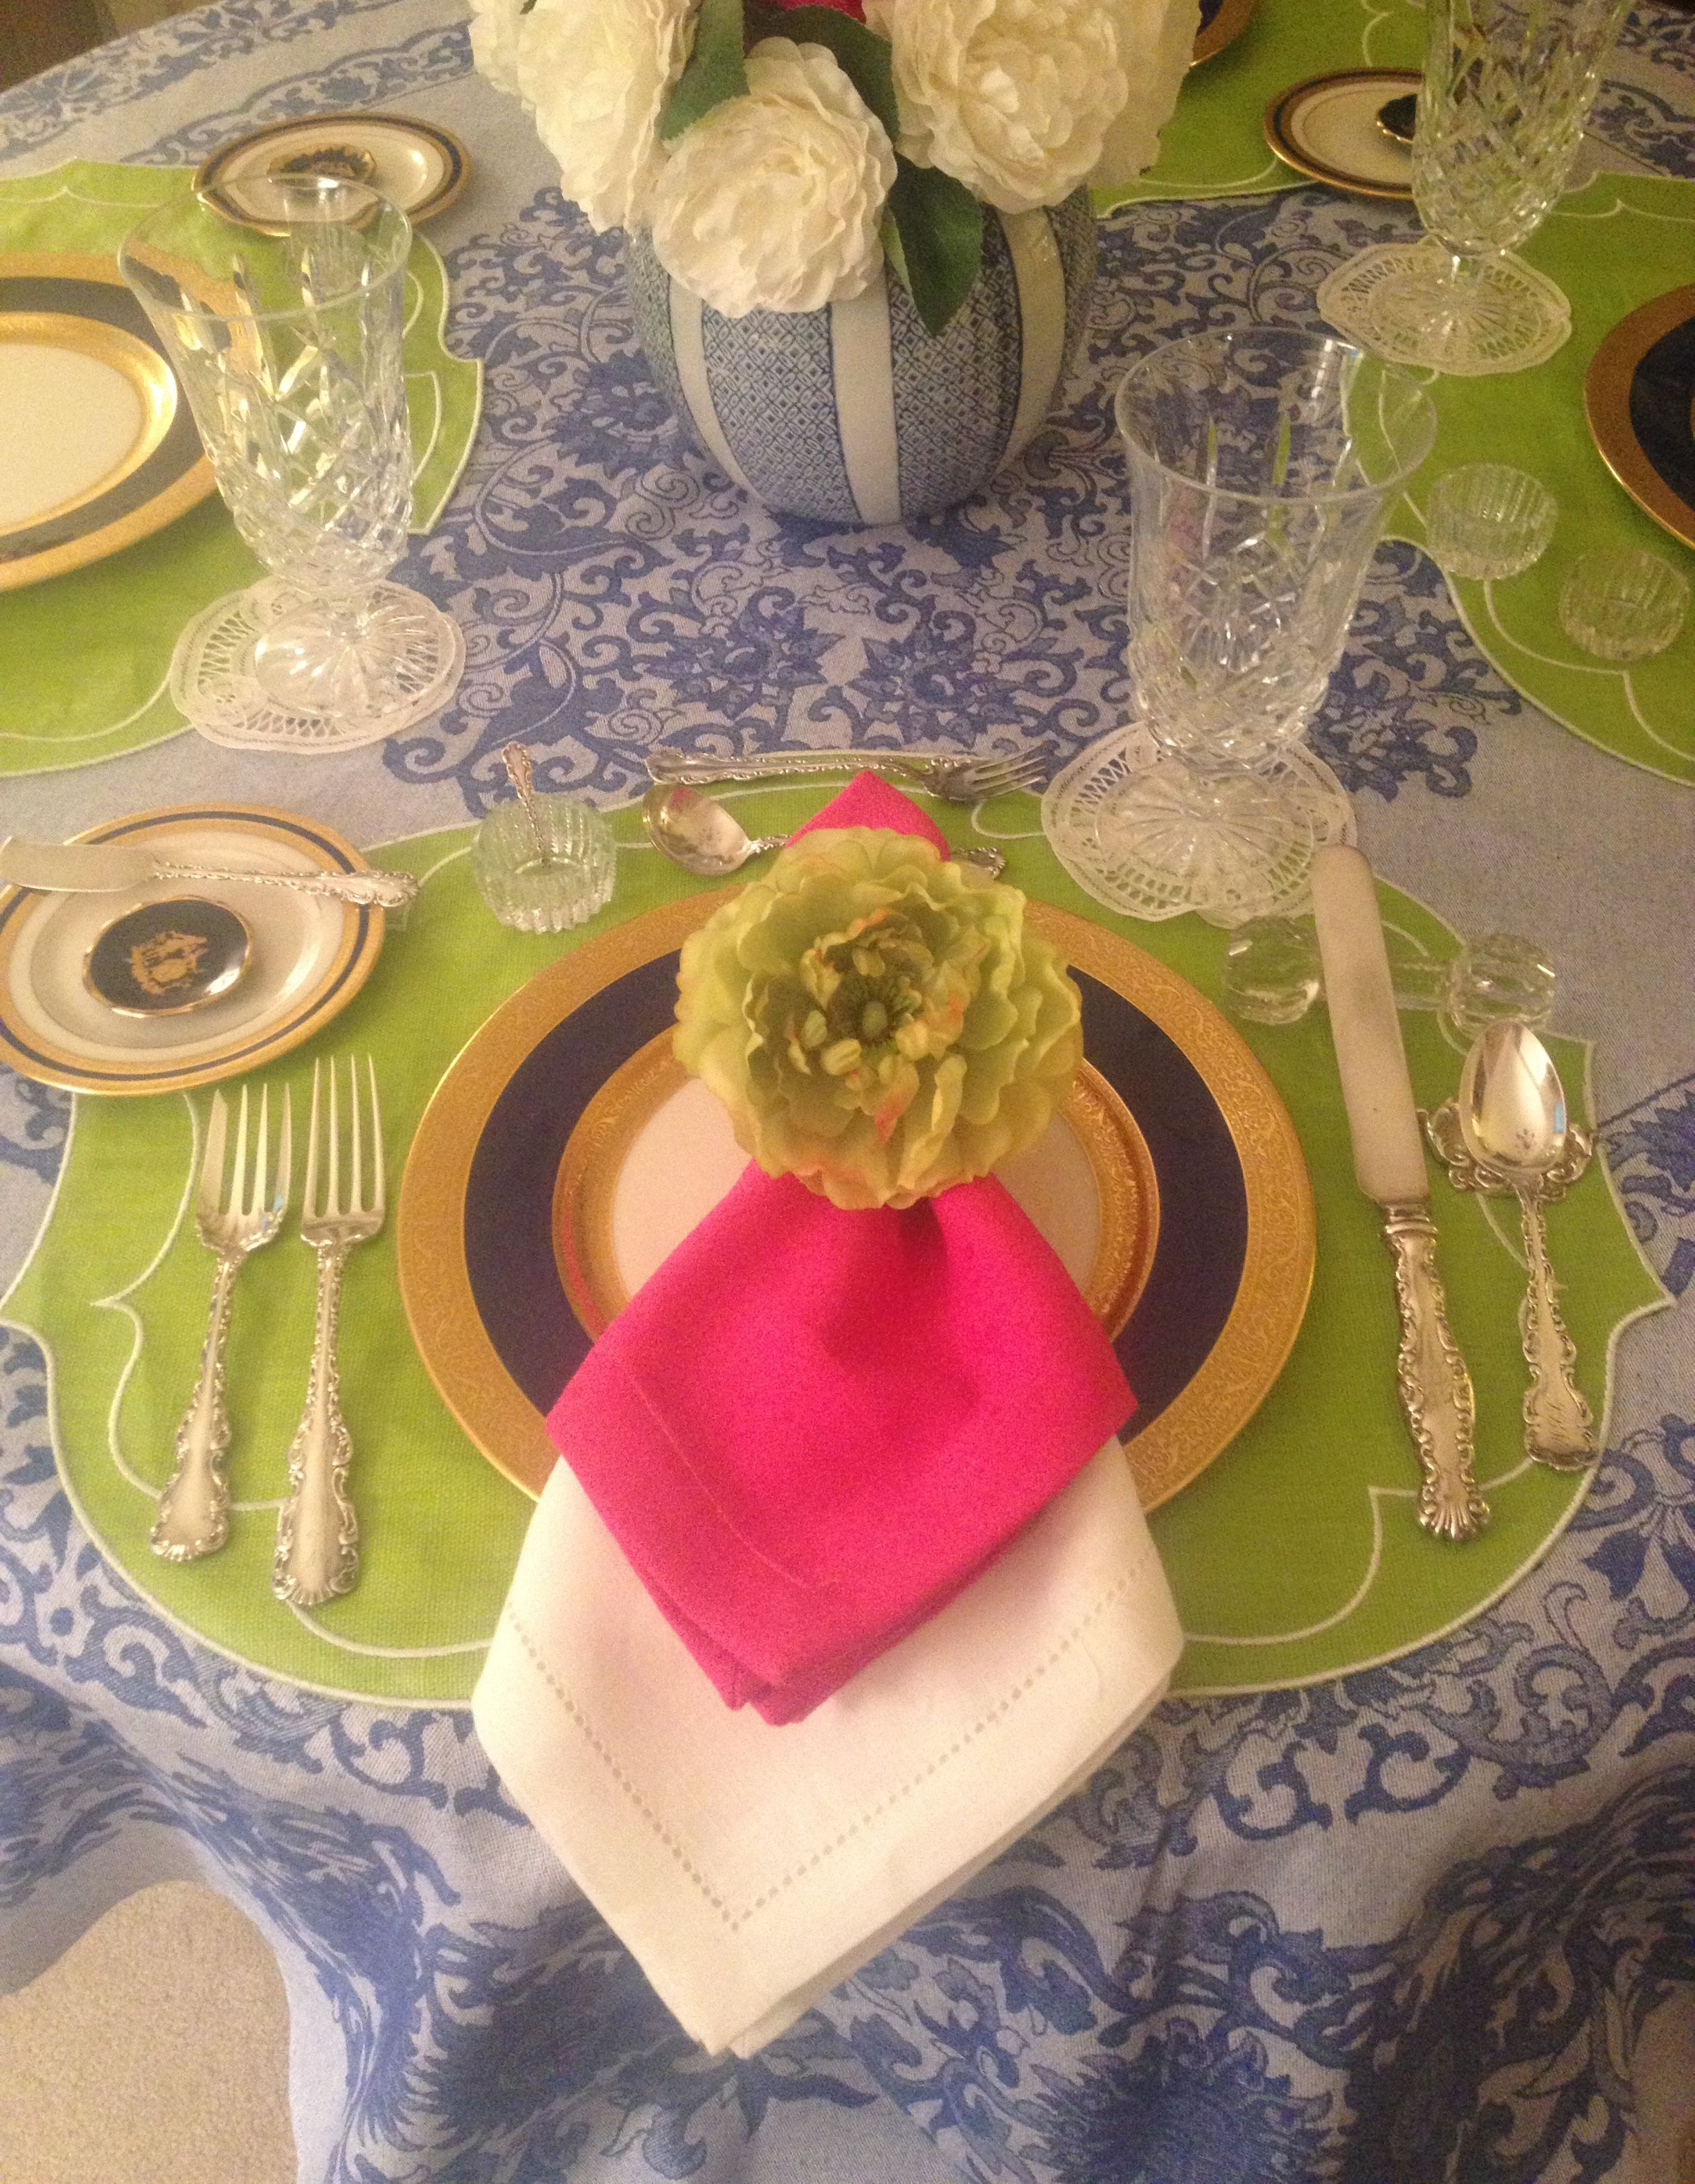 Pin By Susan Jaquith On La Gallina Matta Placemats Beautiful Table Settings Beautiful Table Table Settings